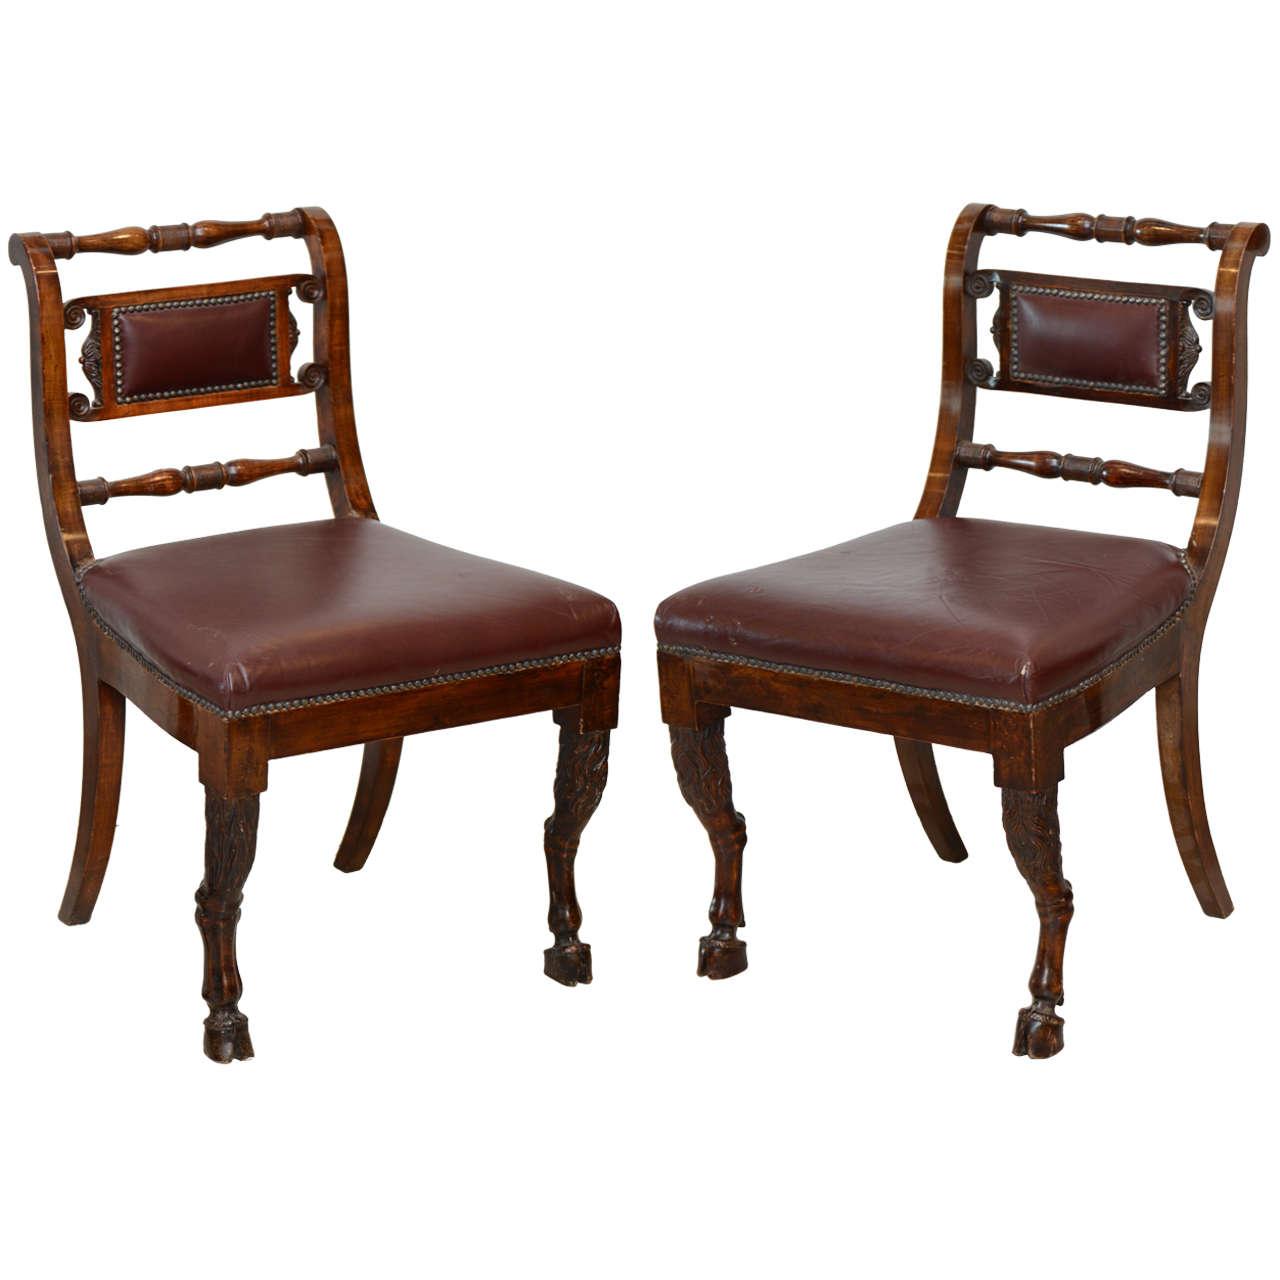 Set of Four Italian Empire Walnut Sidechairs, Early 19th Century